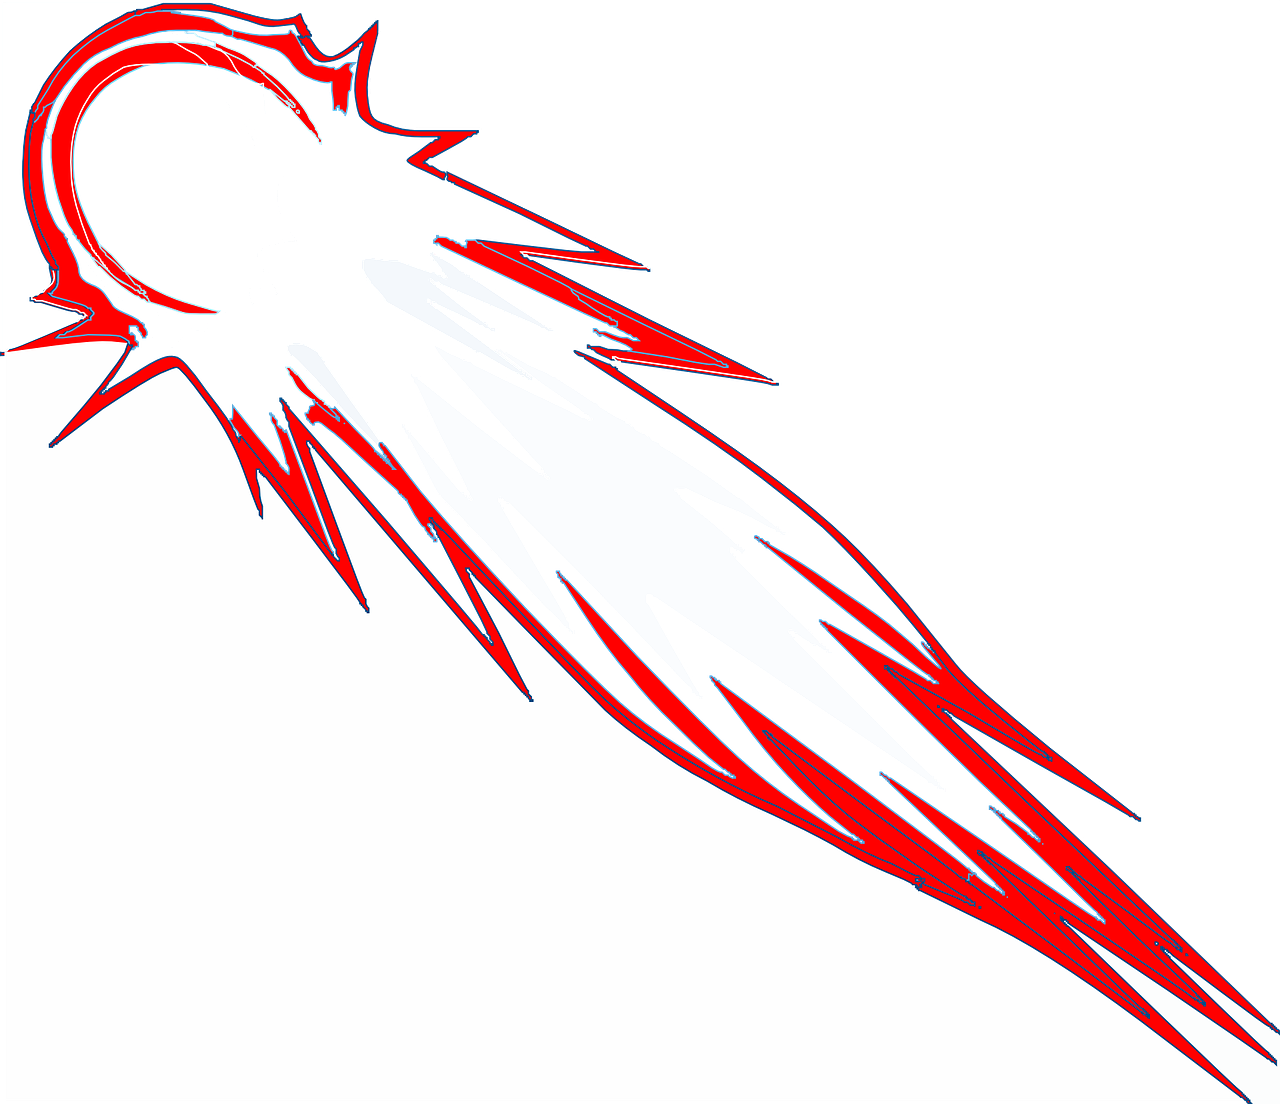 Нарисованная комета картинки